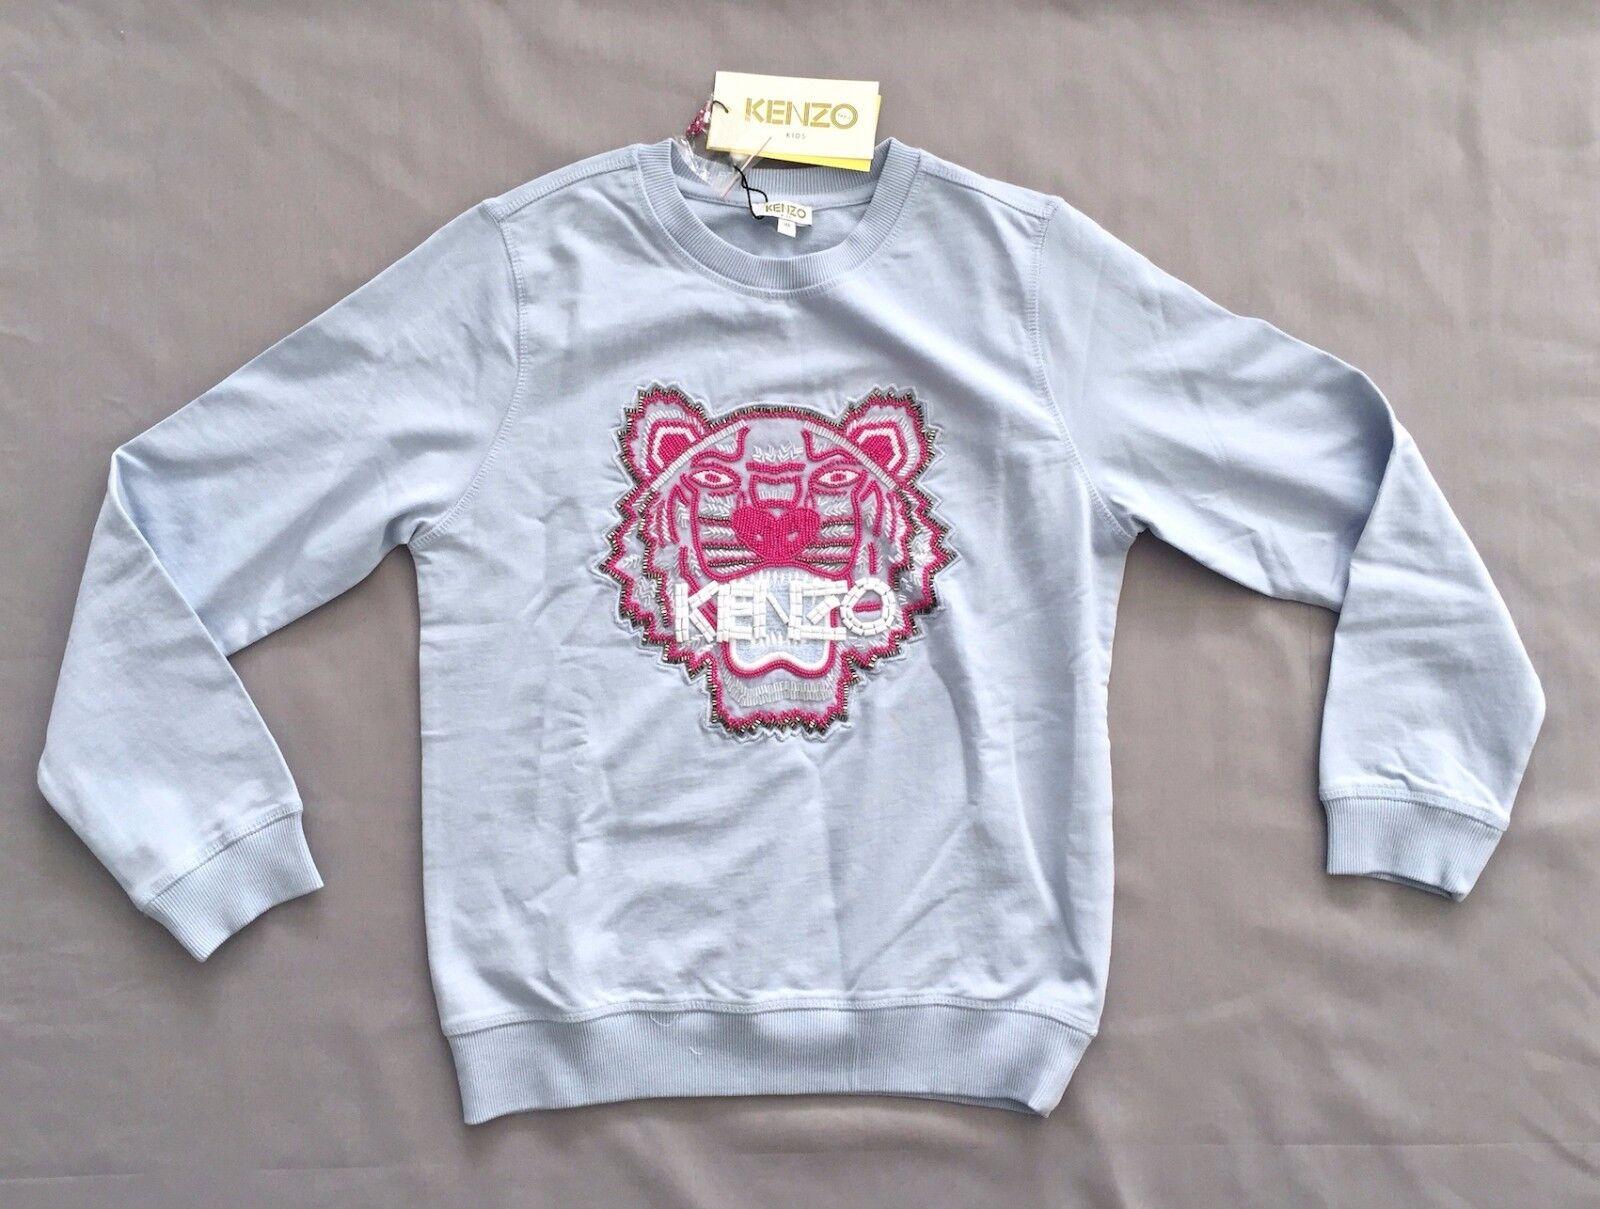 fba8def6b Kenzo Kids Girls Embroidered Pearl Tiger Sweatshirt Sweater 12 13 ...